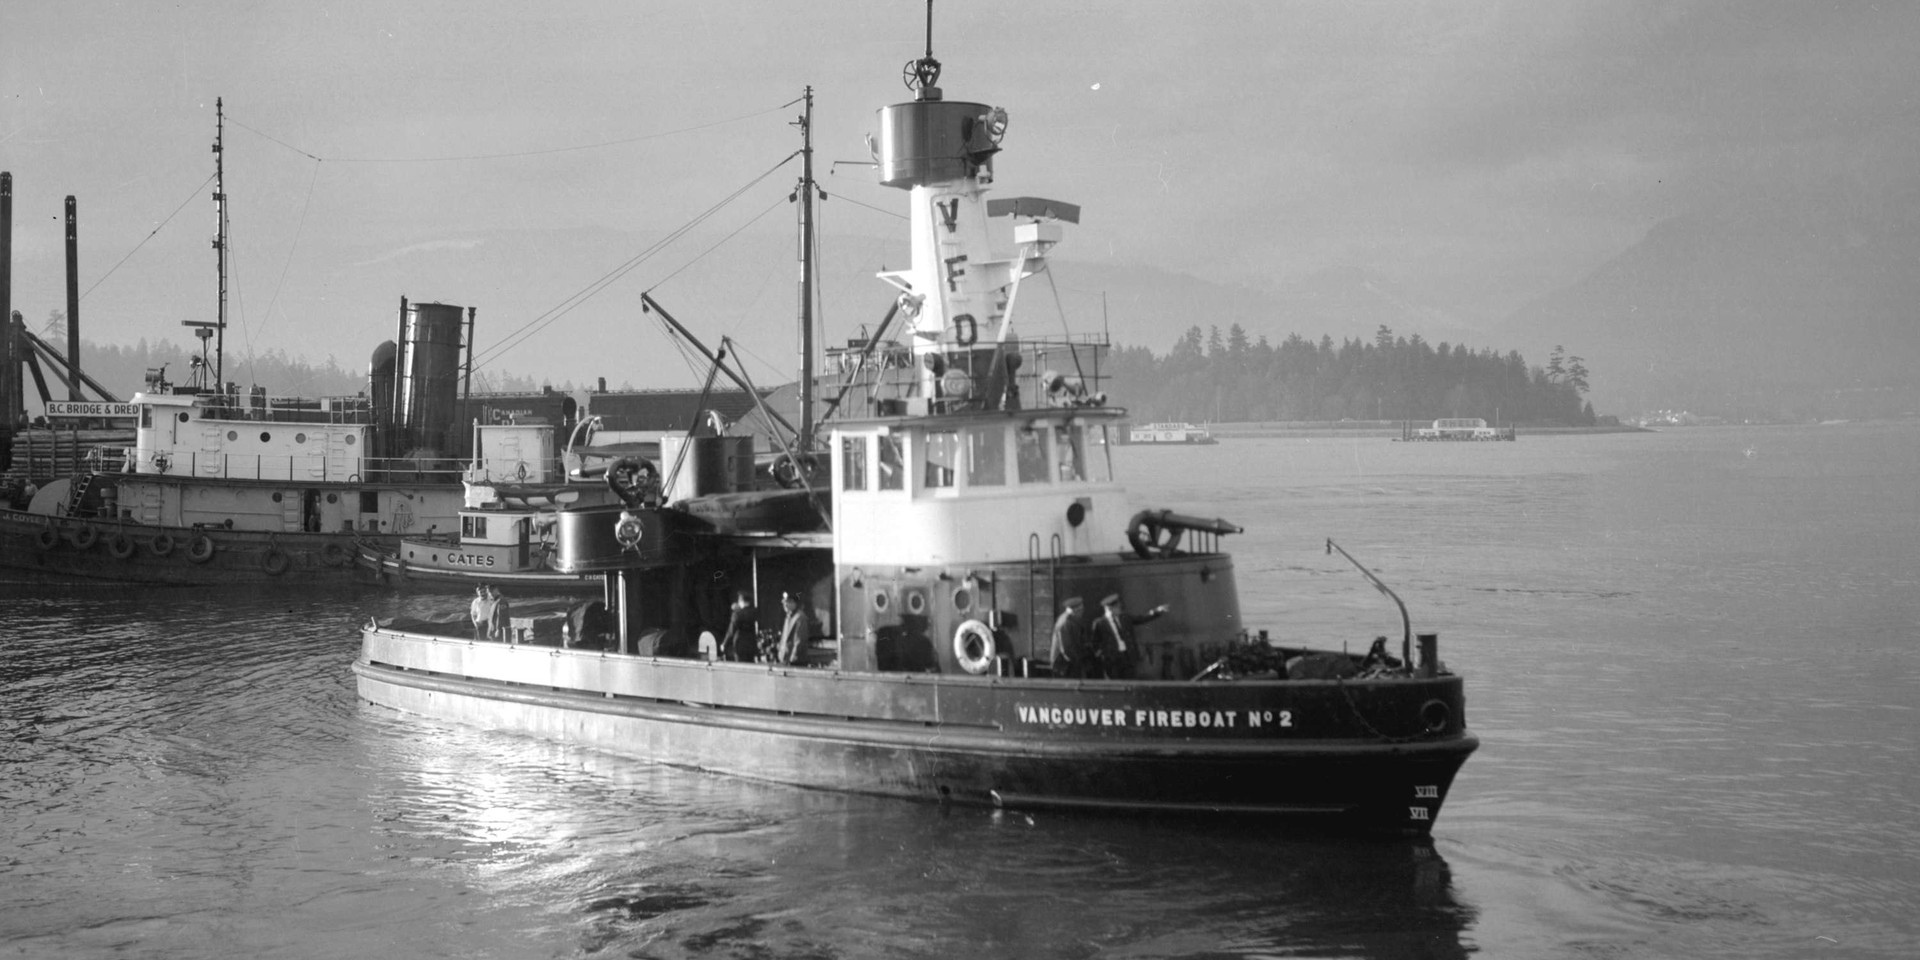 VANCOUVER FIREBOAT NO. 2 (1951-1989)